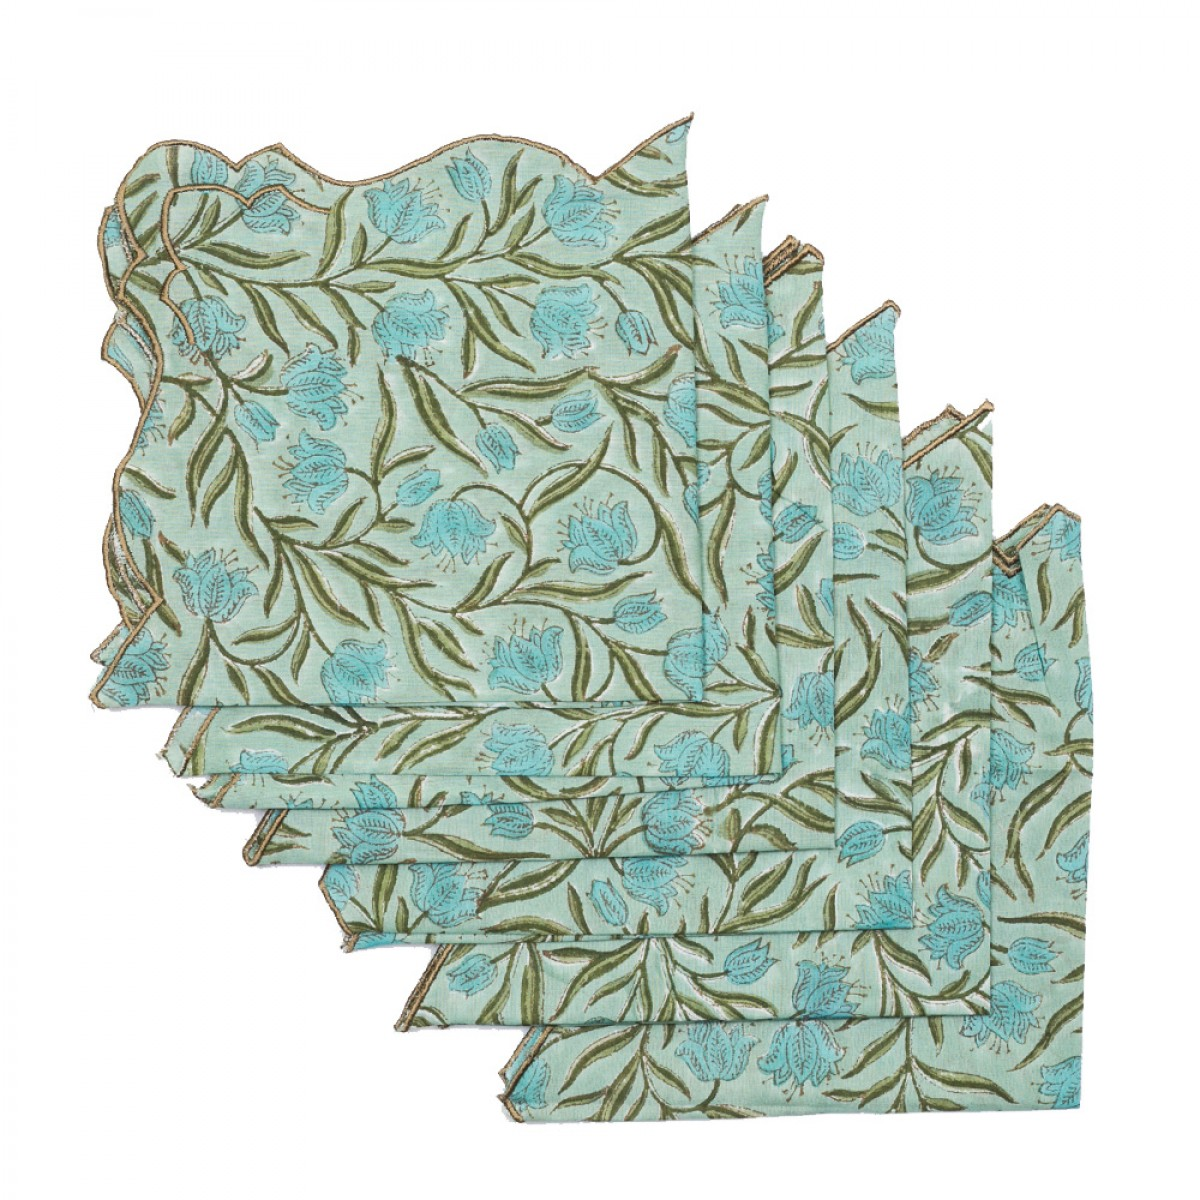 Cotton Scallop Embroidered Printed Napkin - Pistachio Green (Set of 6)